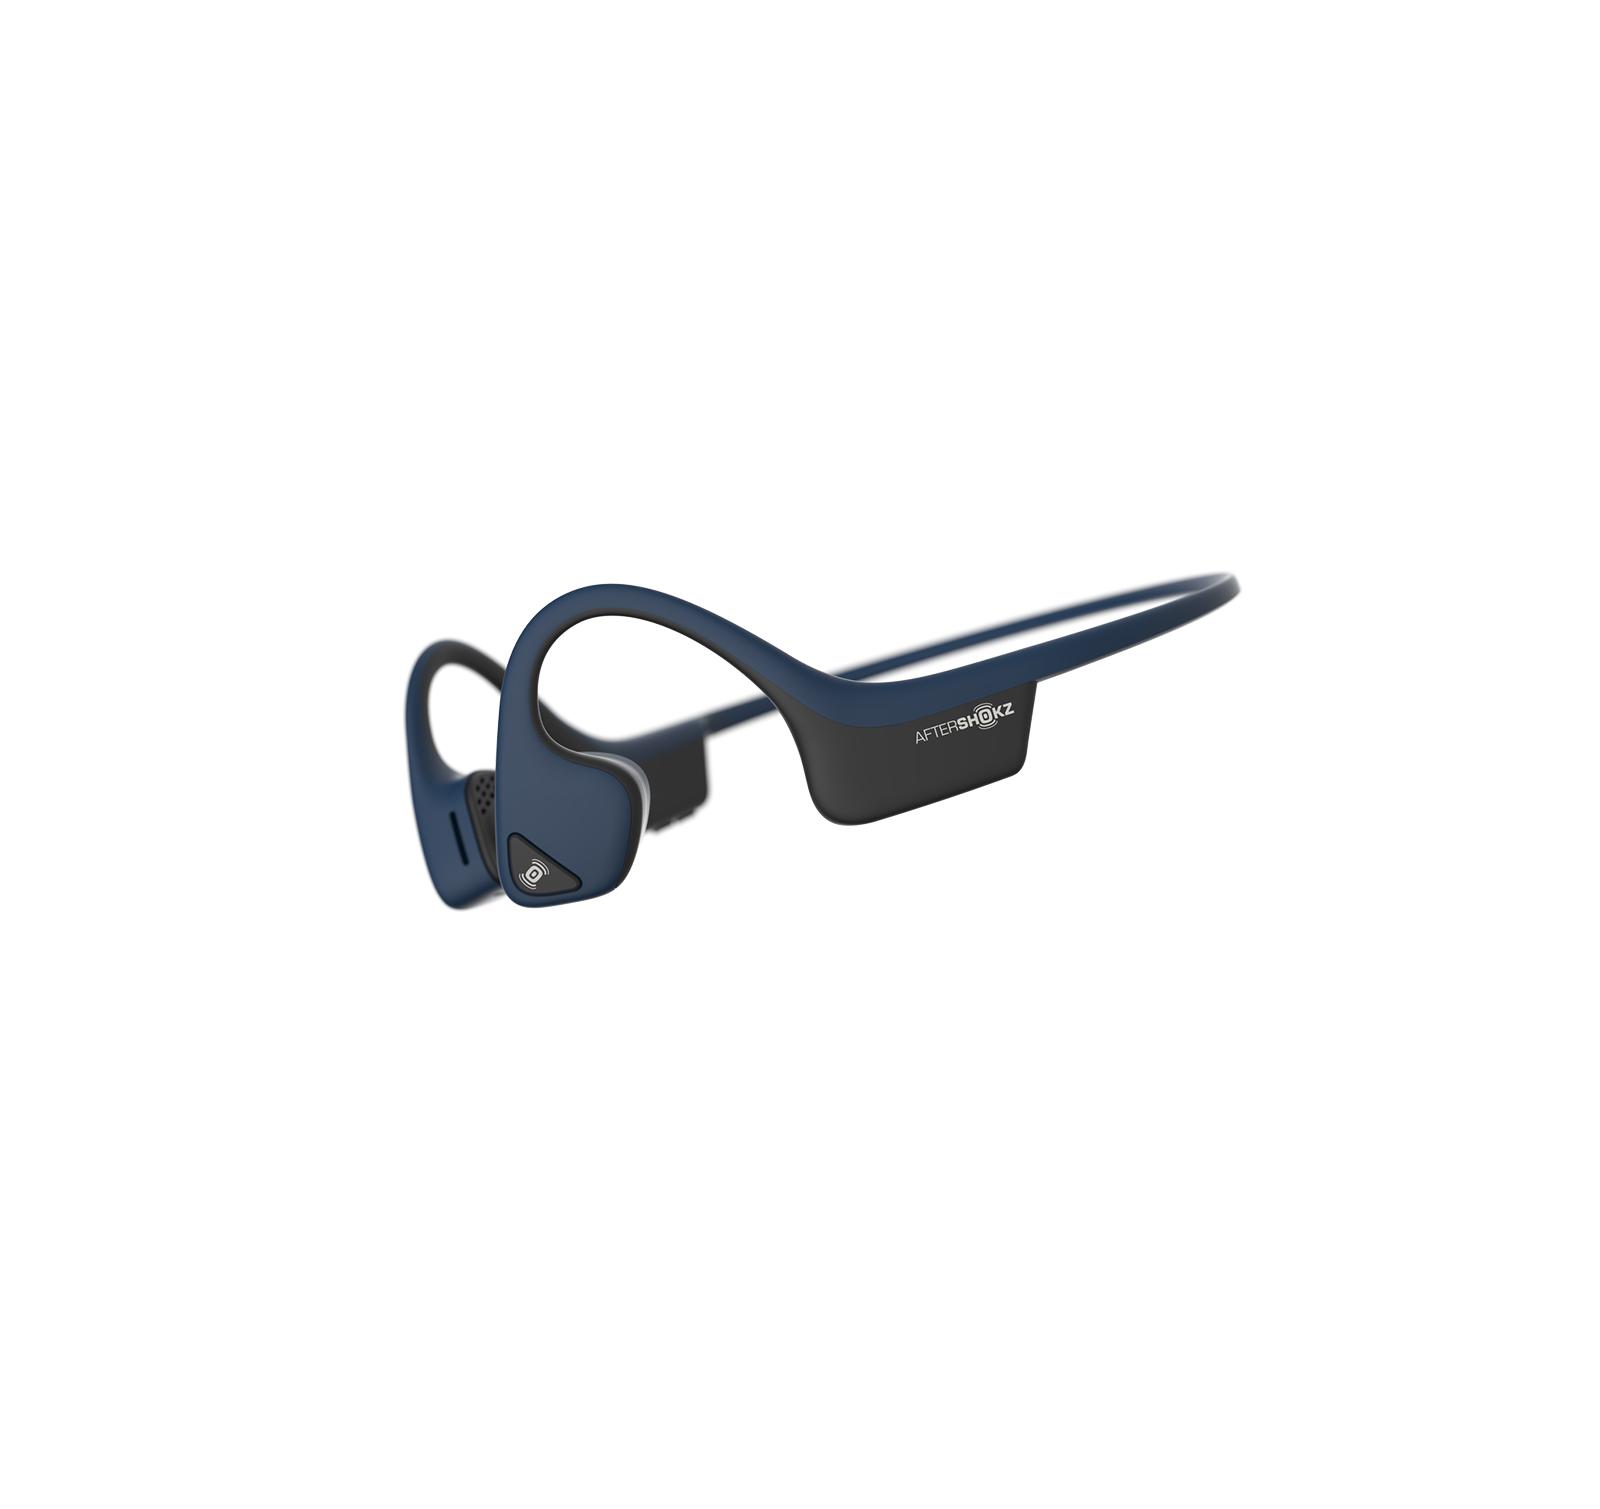 AfterShokz-Trekz-Air-Wireless-Bone-Conduction-Headphones thumbnail 3